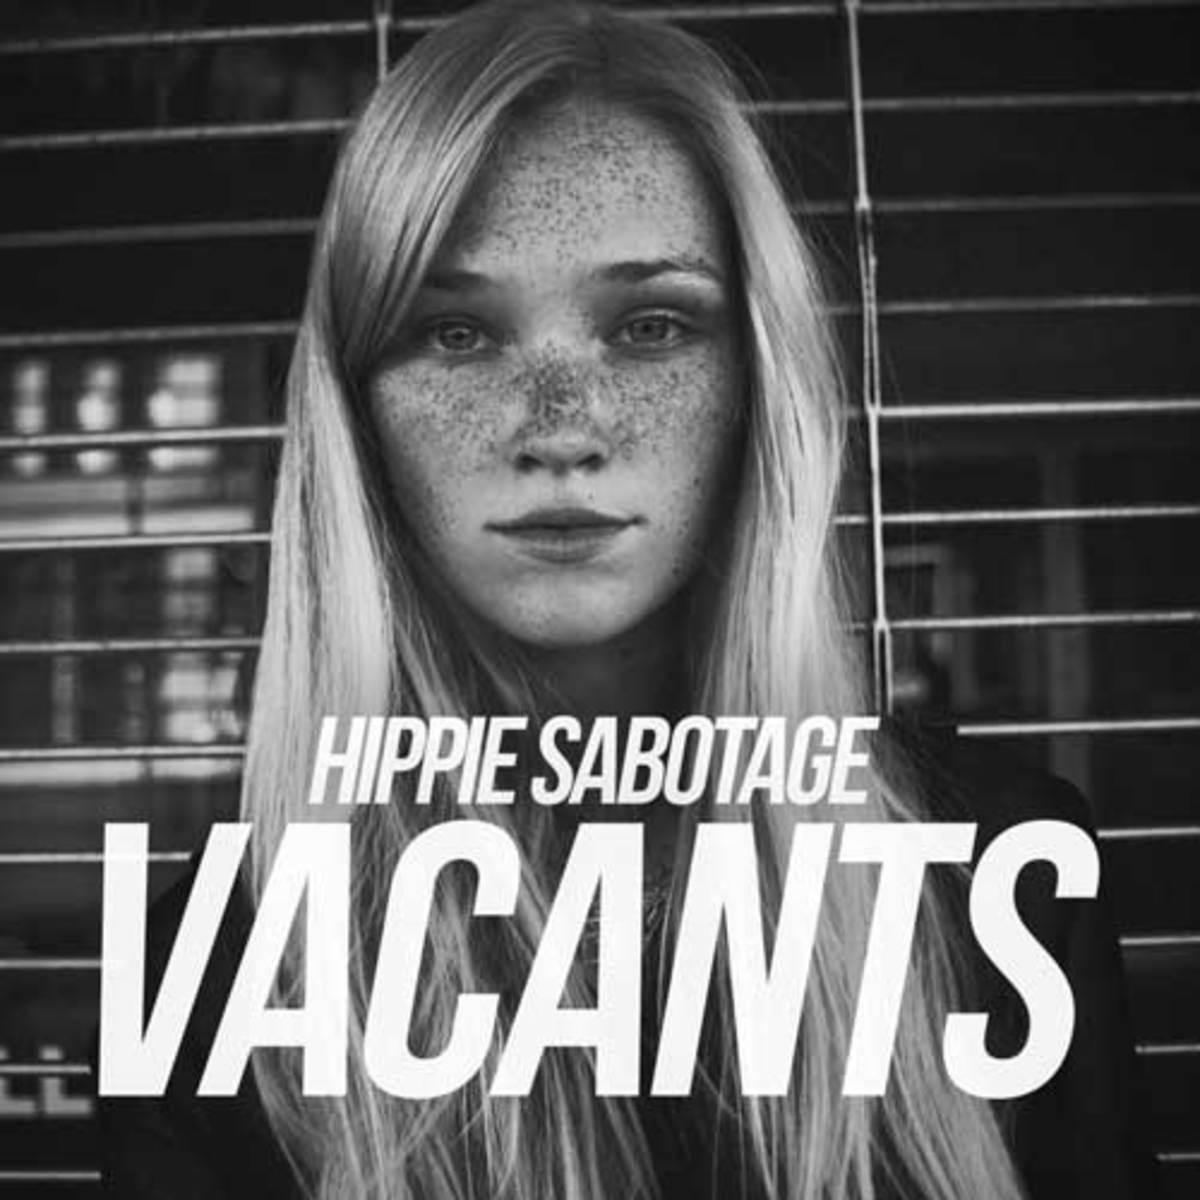 hipsab-vacants.jpg